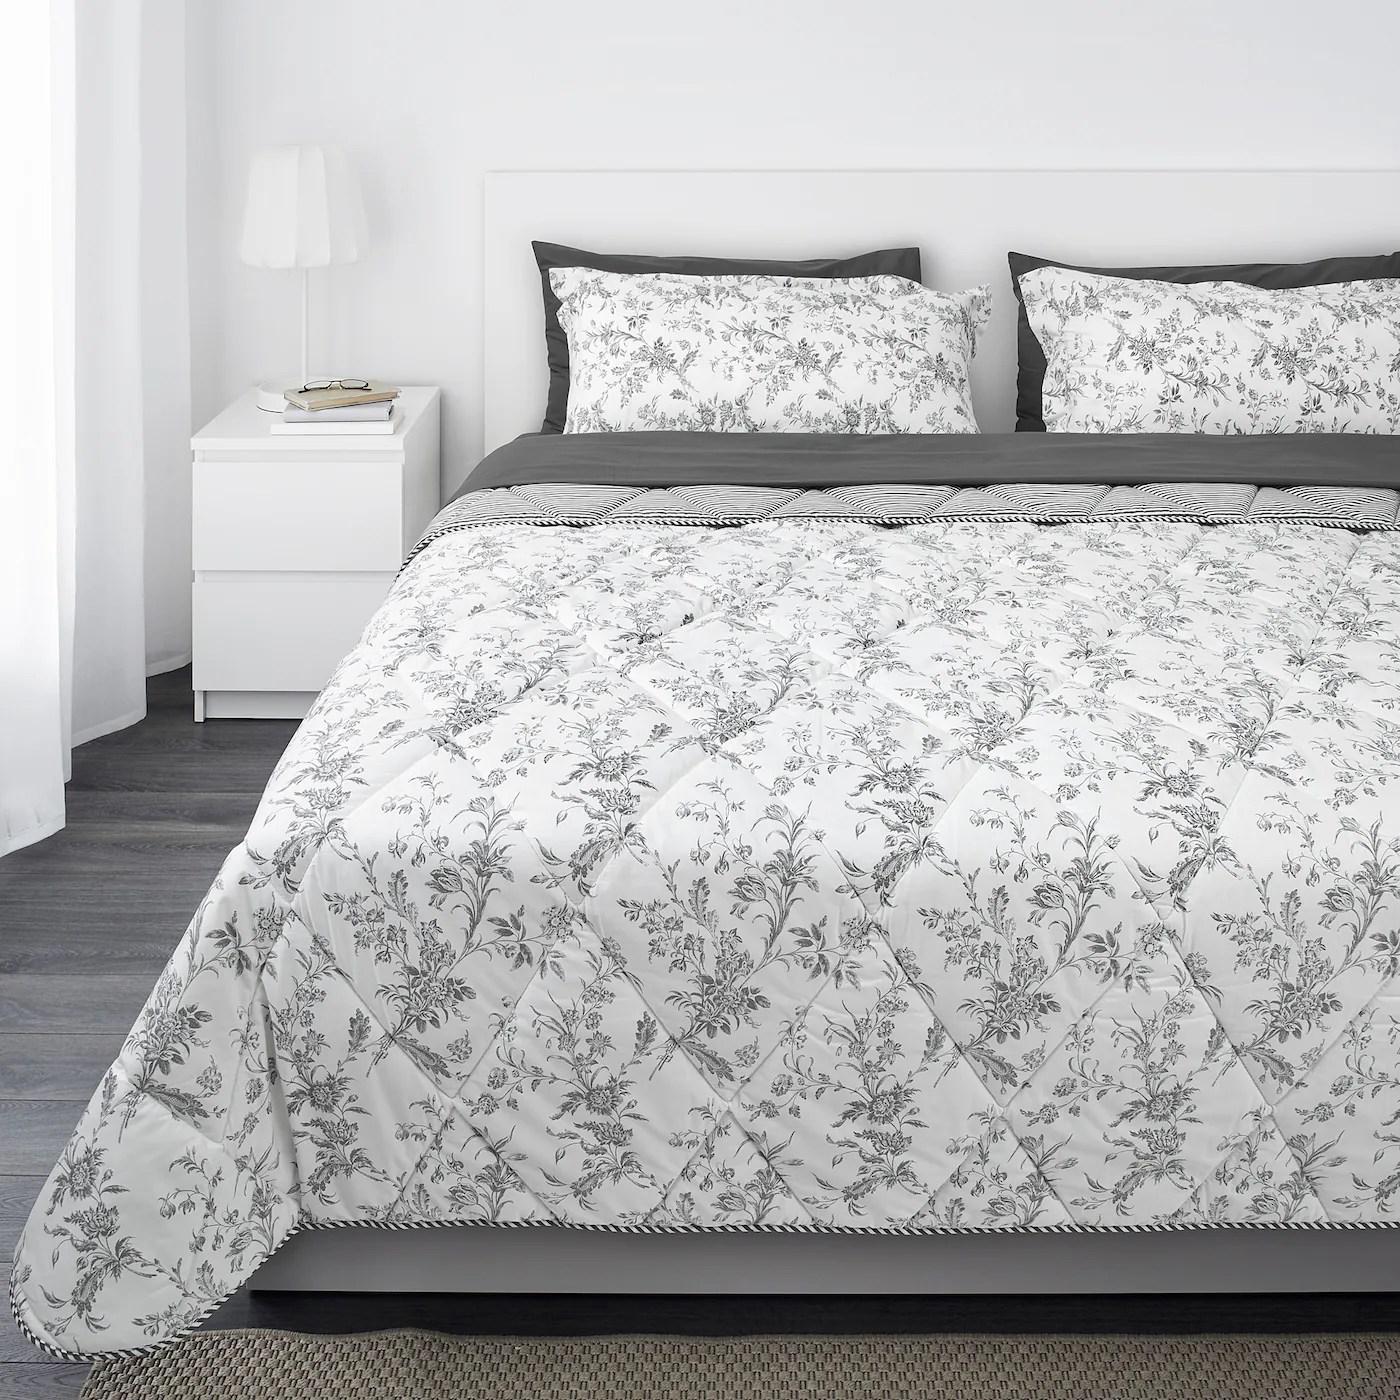 kirskal comforter set 7 pieces white gray king